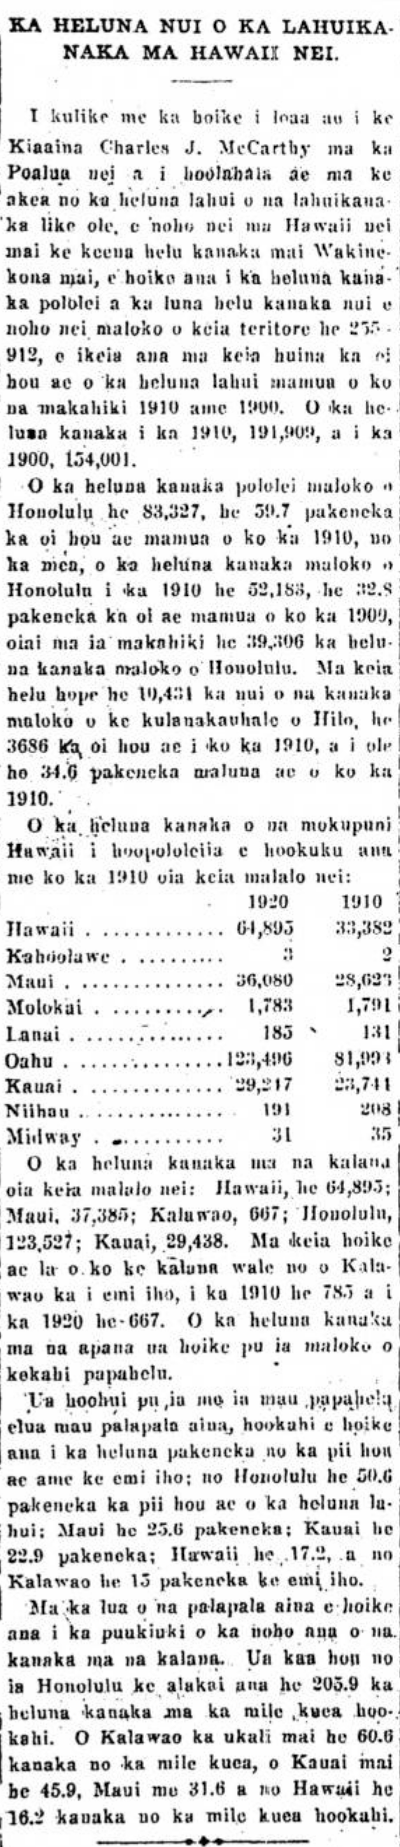 Kuokoa_8_6_1920_1